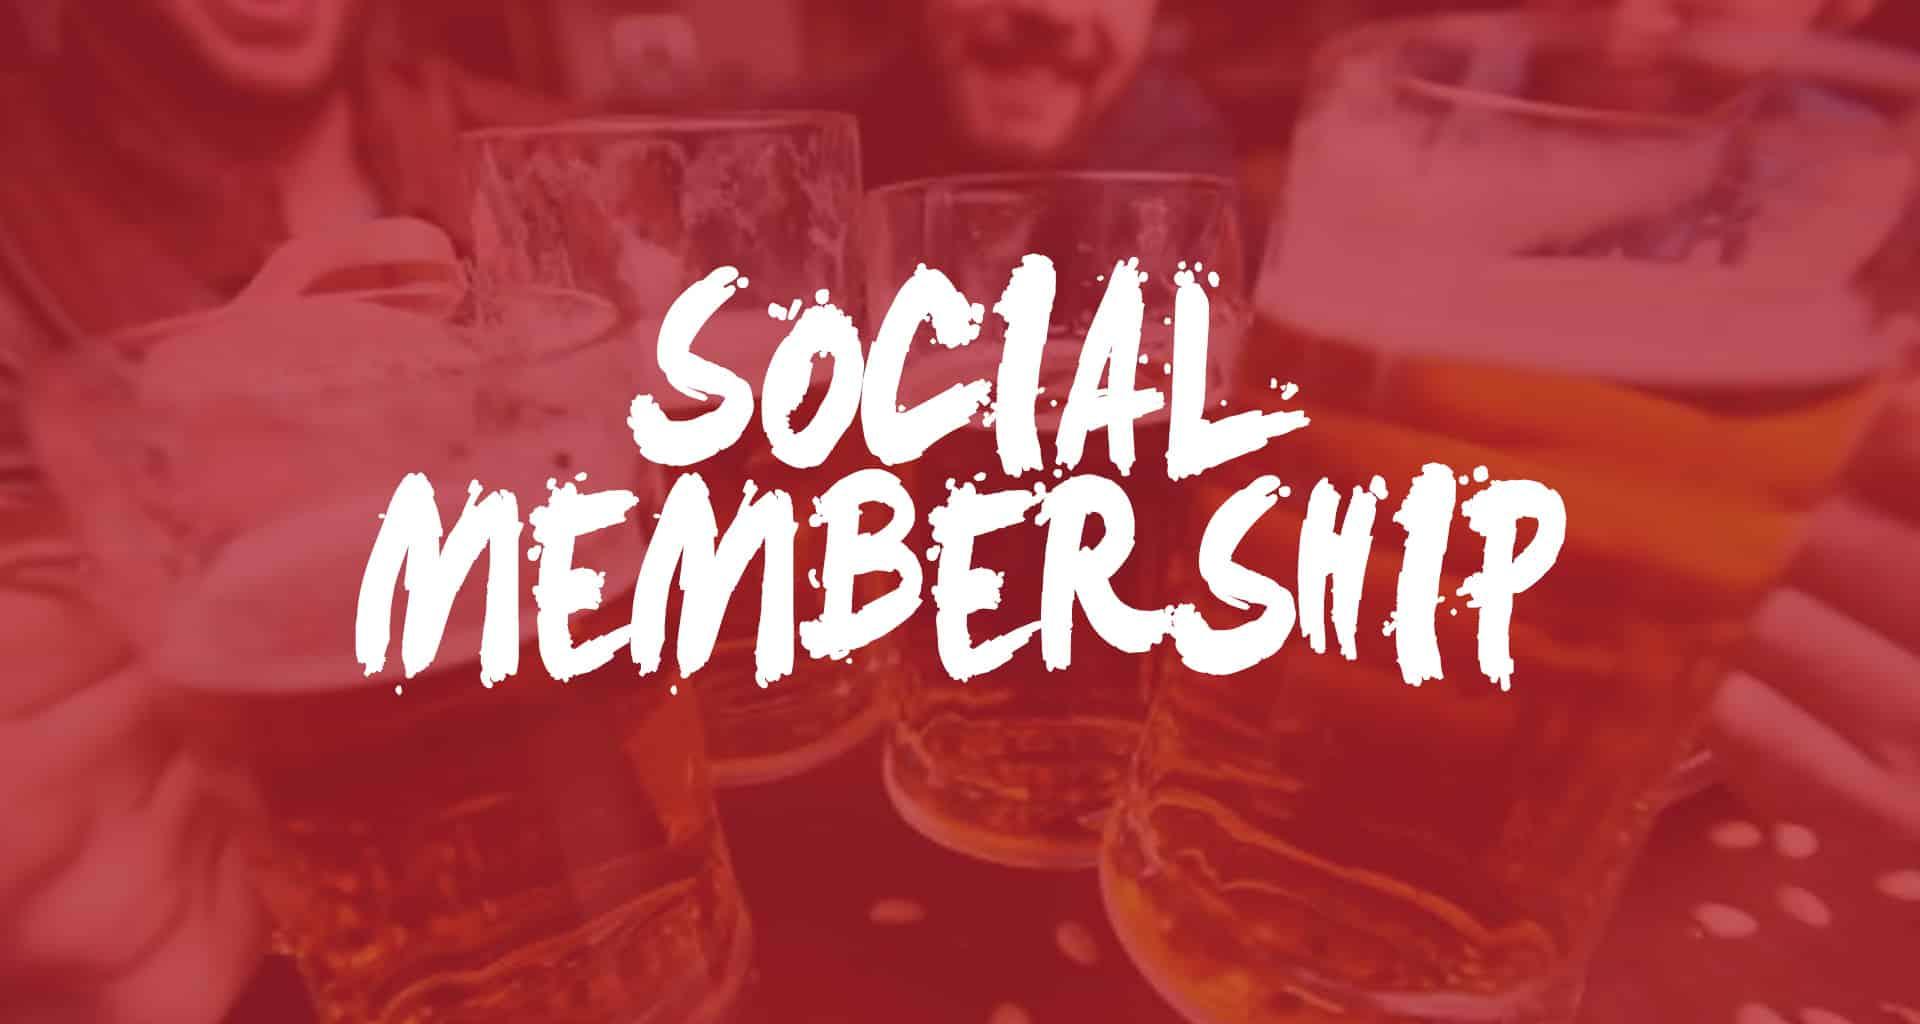 https://wilmslowcricketclub.com/wp-content/uploads/2020/03/Social-Membership.jpg